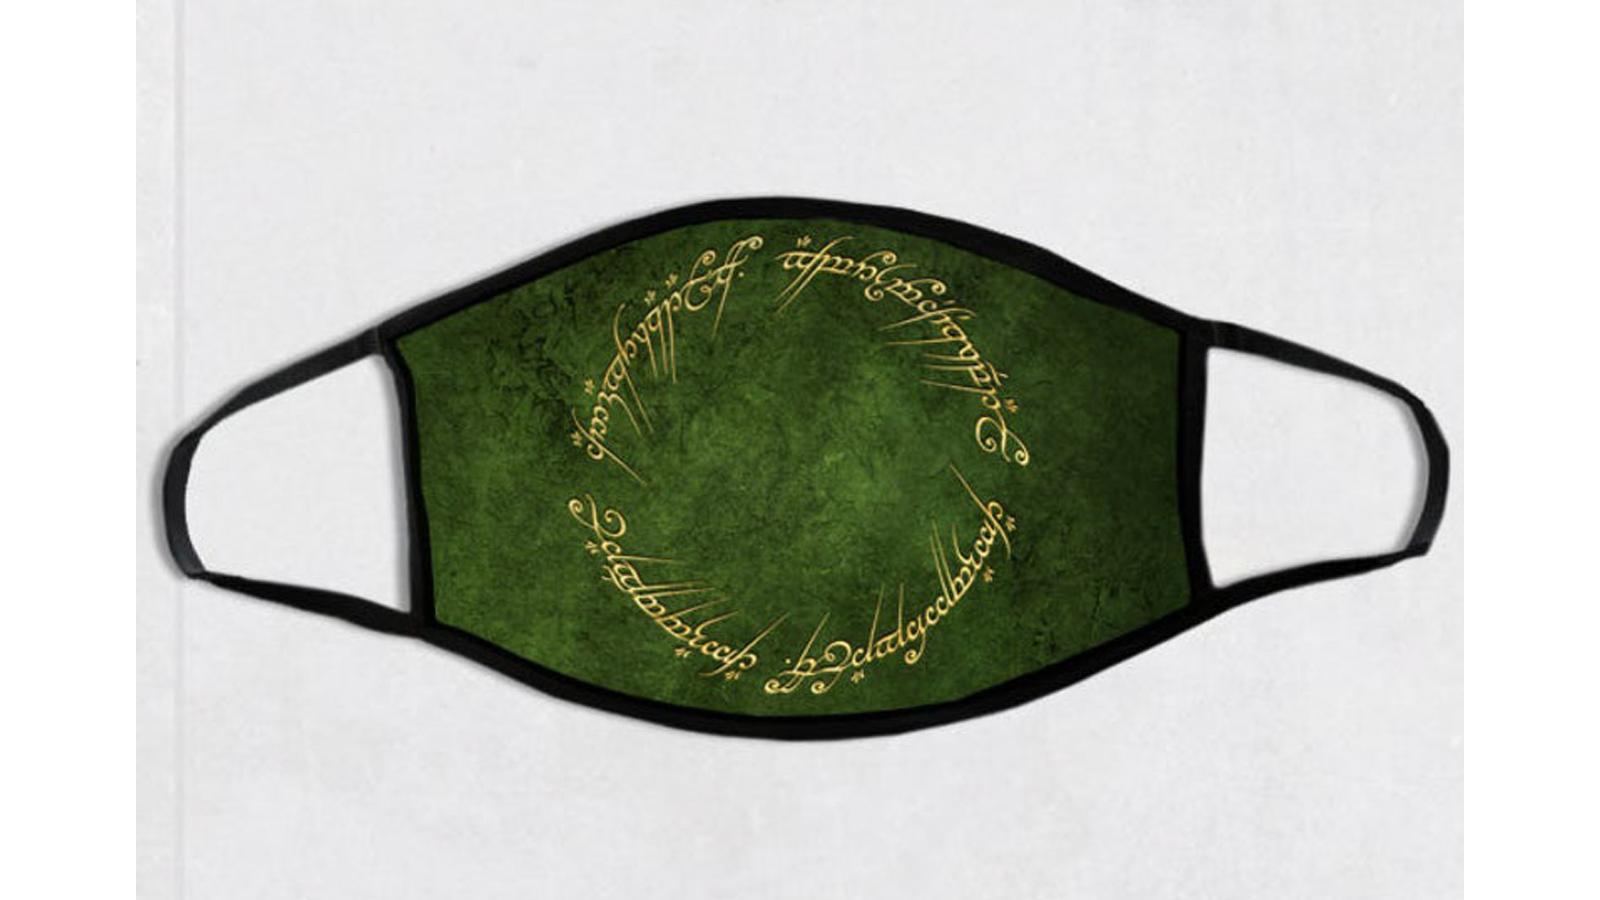 Best lord of the rings face mask hobbit bilbo gandalf sauron gollum